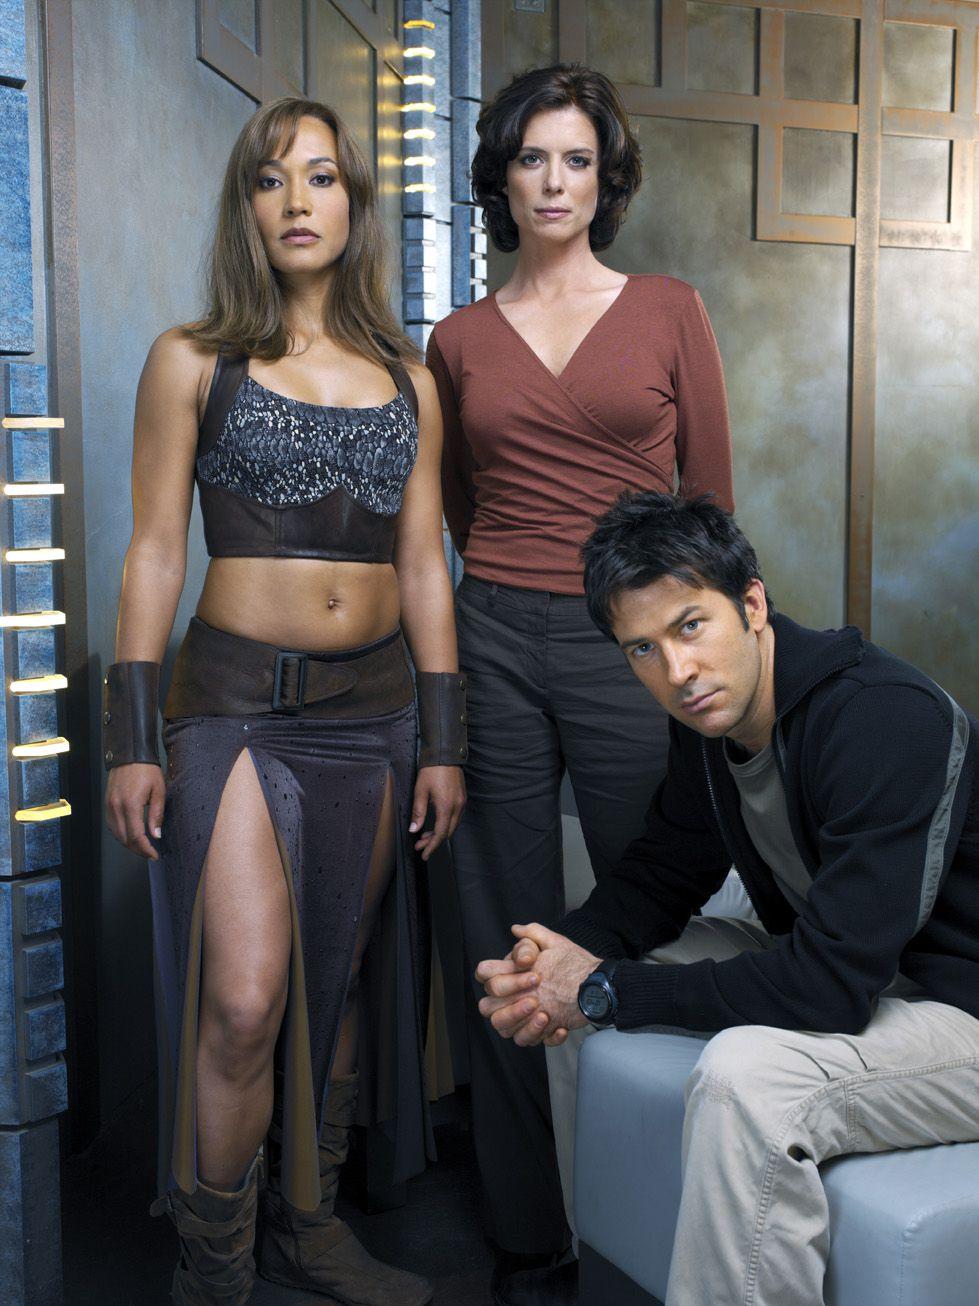 cast_season2_09.jpg